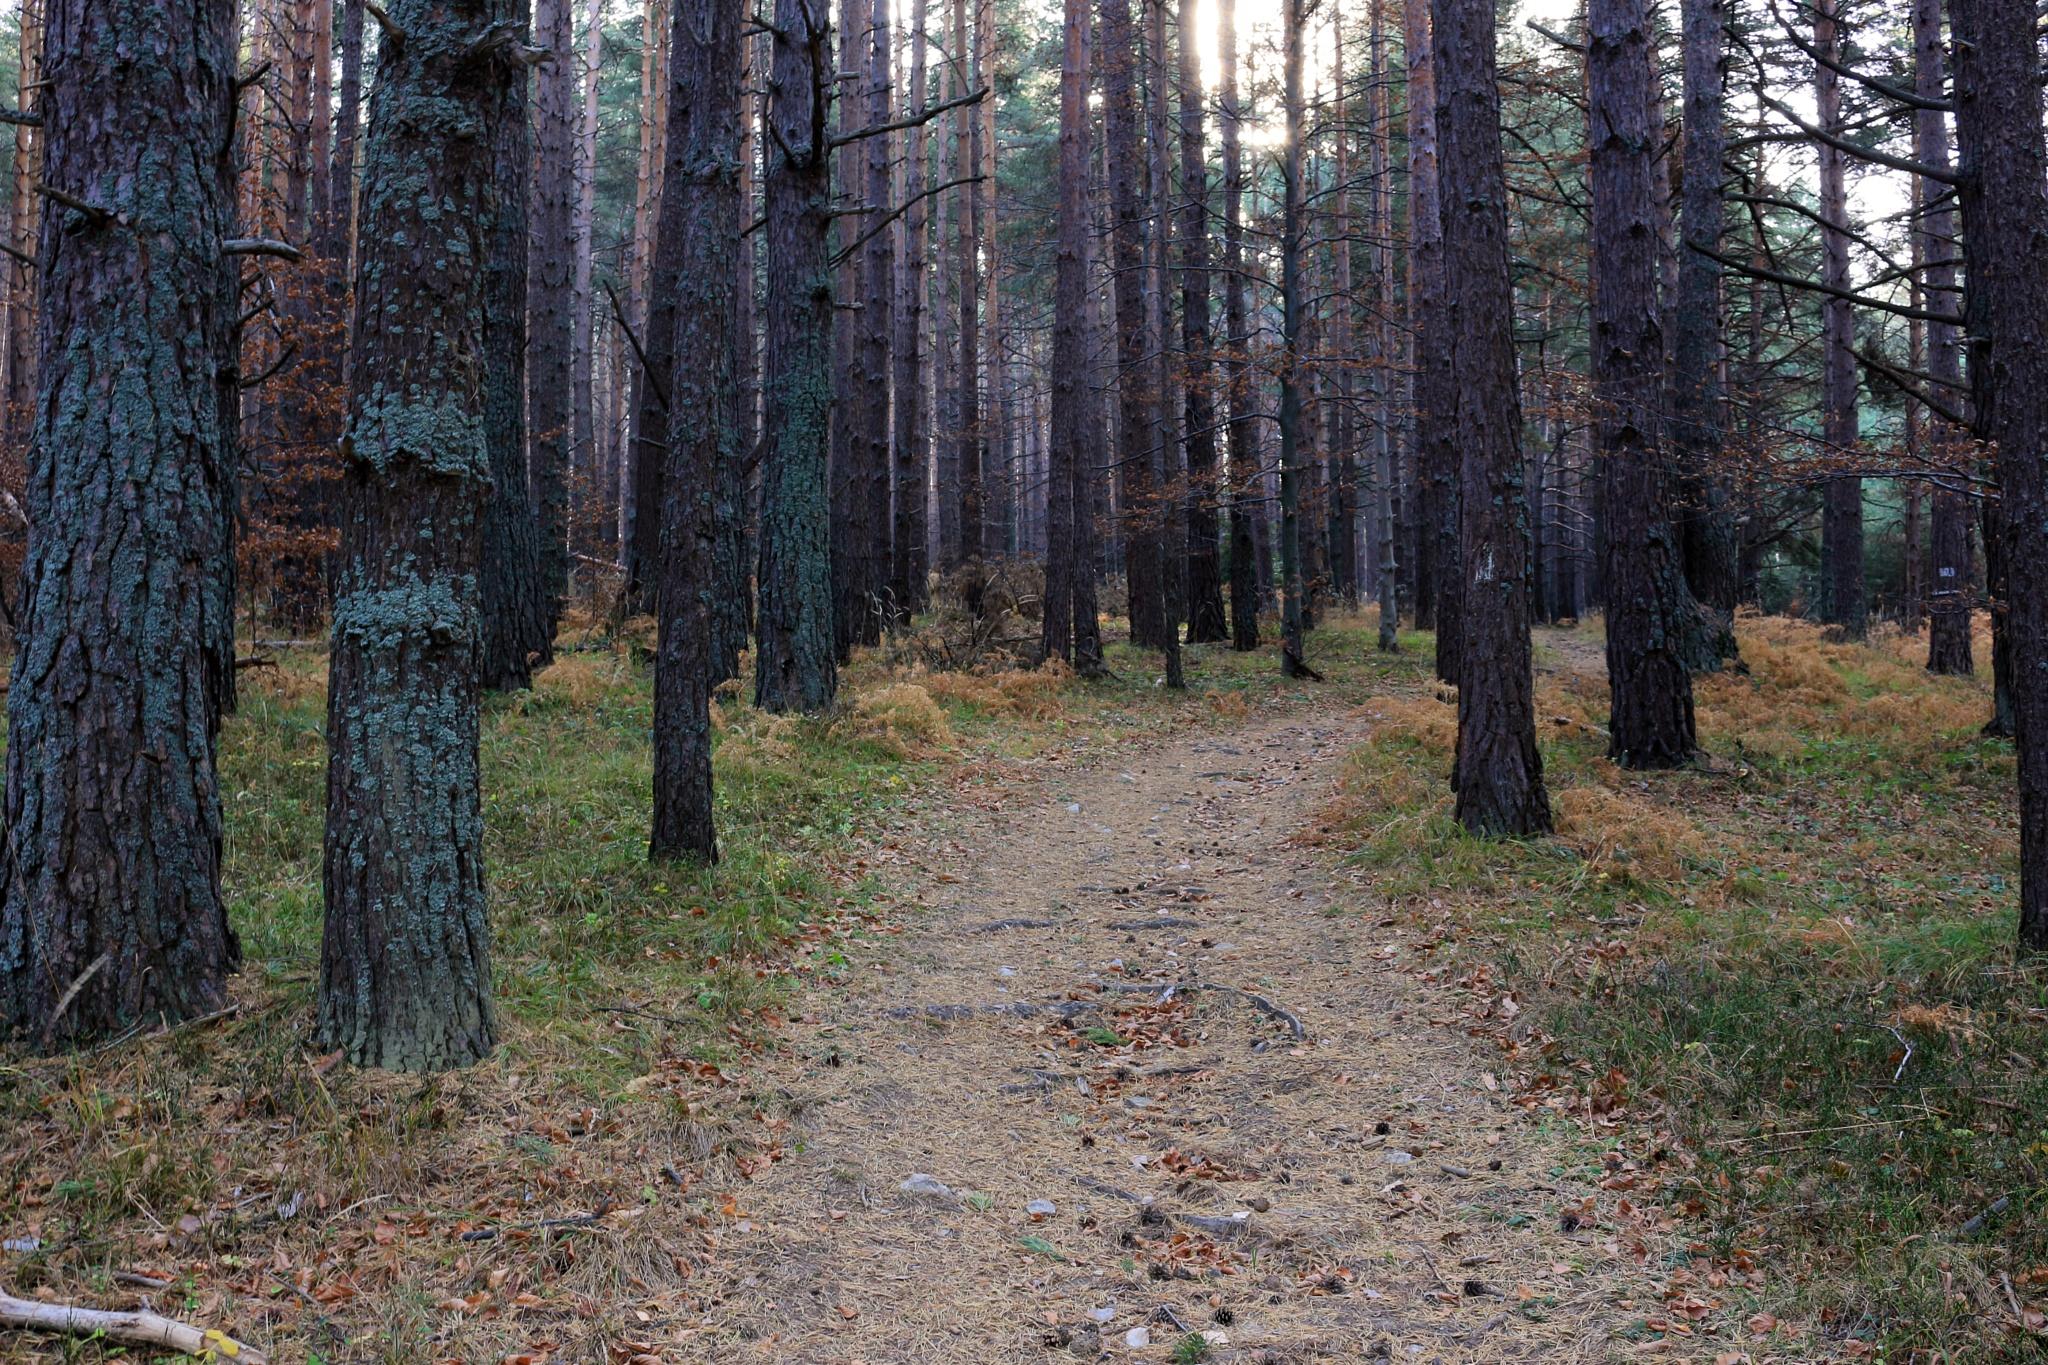 Mystic forest by Sergey Sokolov